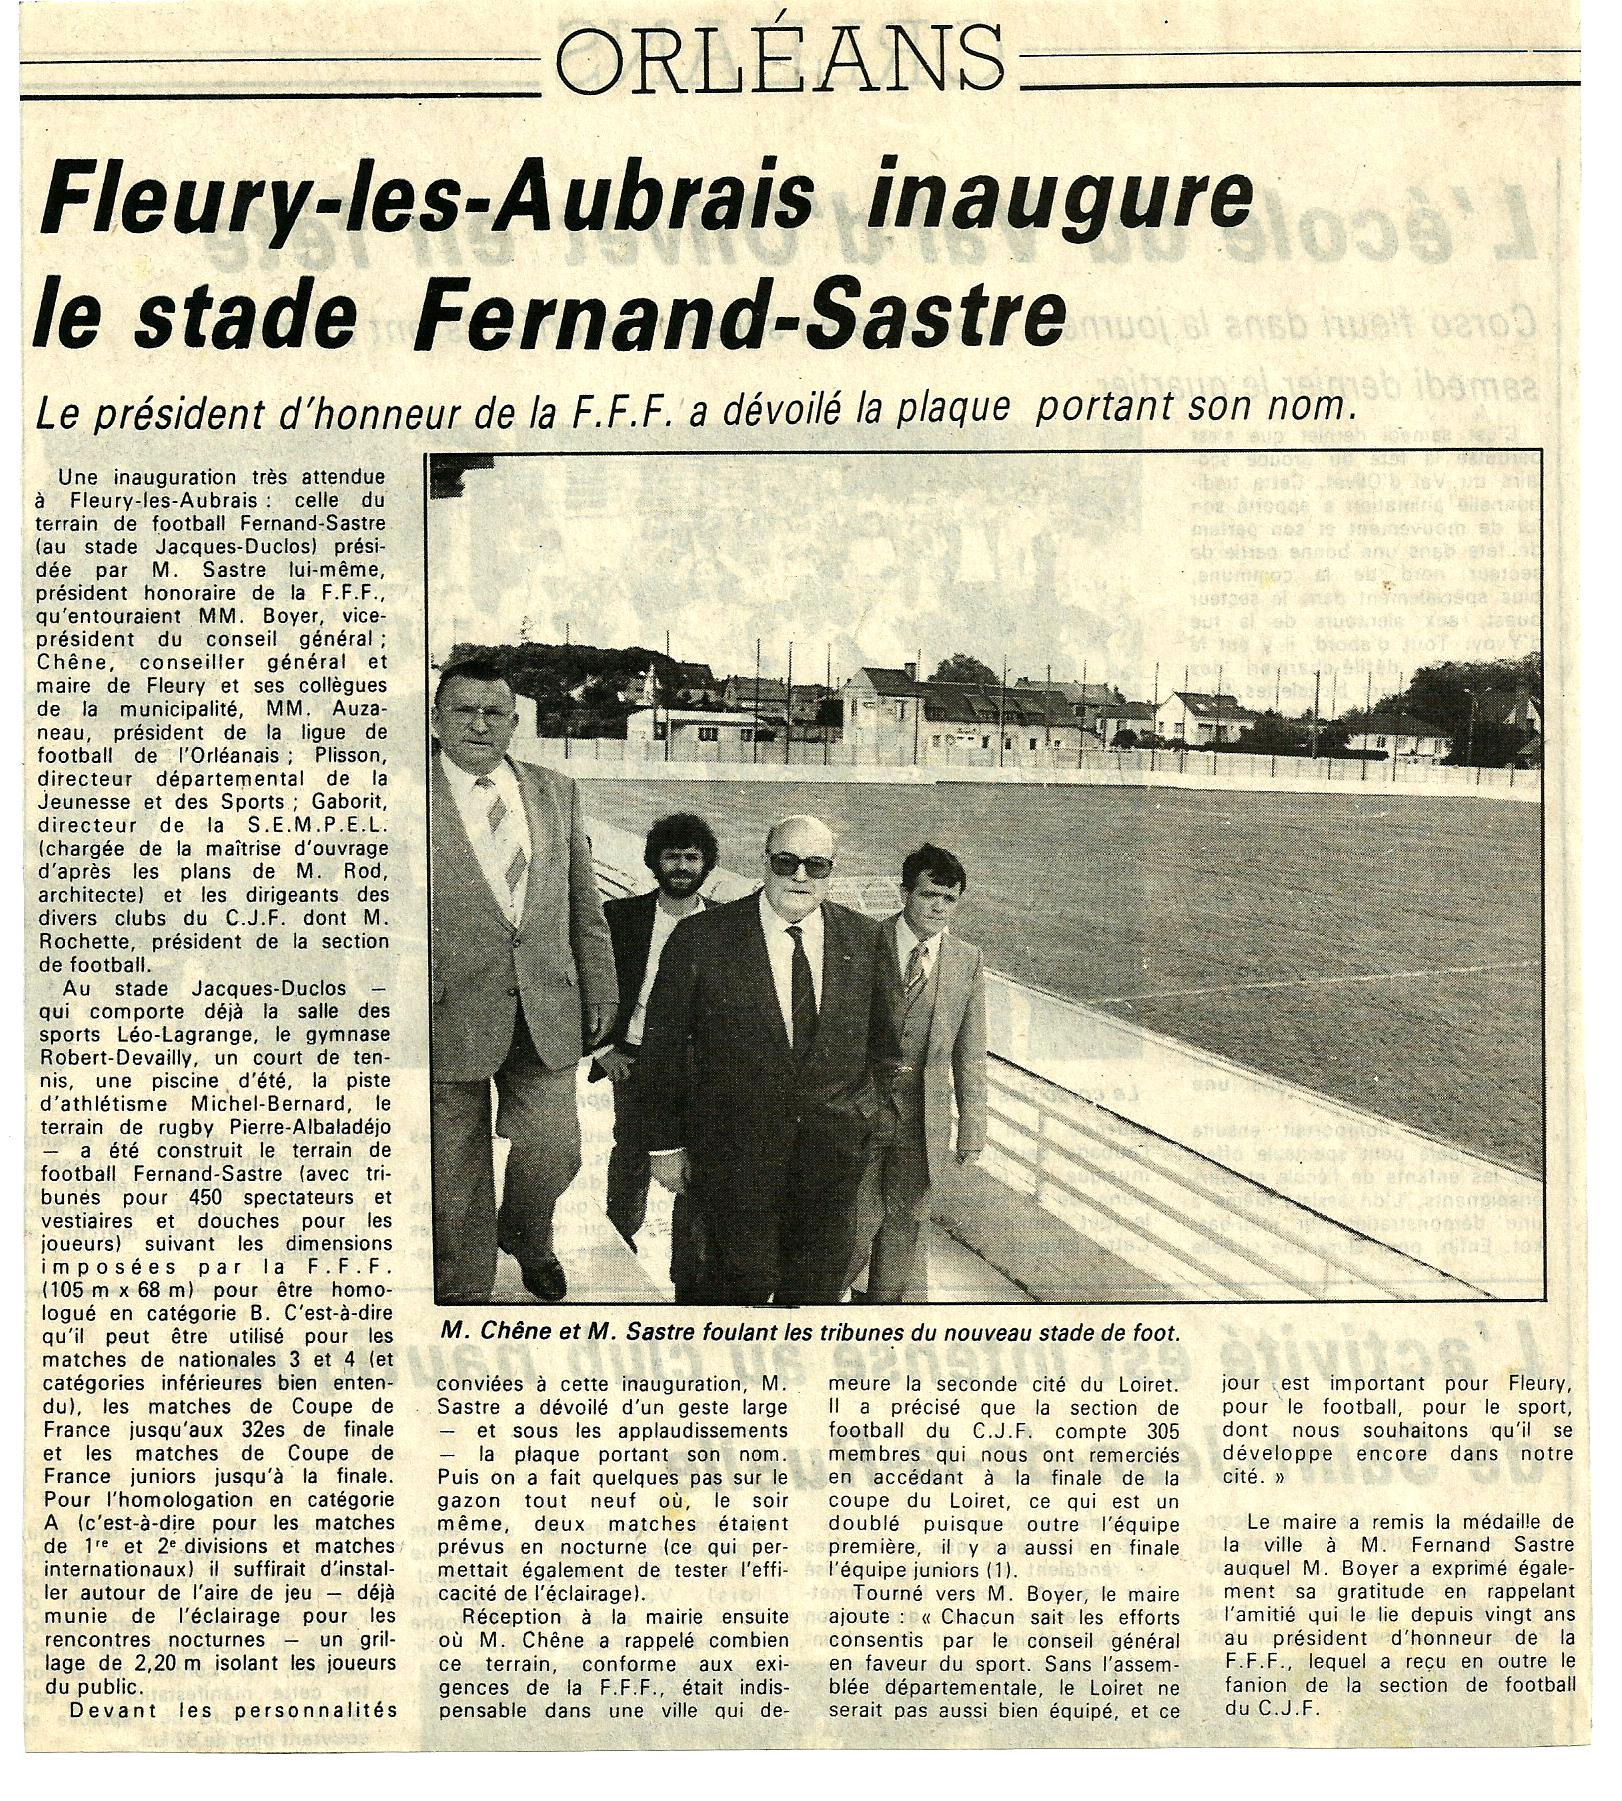 Scan Fleury les Aubrais inaugure le stade Fernand-Sastre (678.jpg